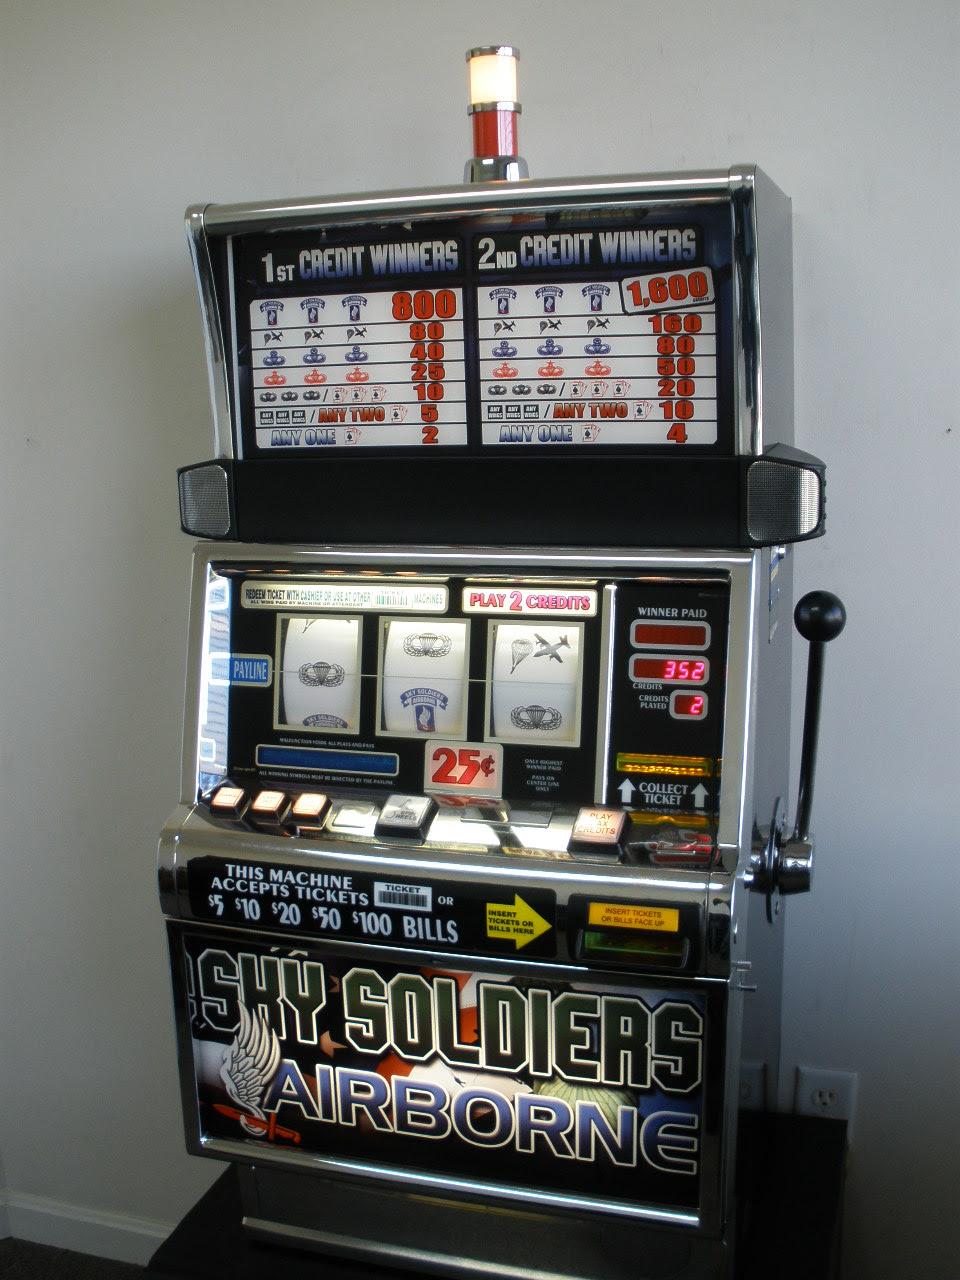 Casino Slot Machine.8 13 0.Slot Machine Wallpaper.13 10 3.Casino Game Of Chance.6 8 0.Slot Machine Game Slot.22 25 0.Poker Chips Gambling.12 12 0.Las Vegas Slots Casino.15 13 0.Addiction Gambling.12 6 2.Casino Game Of Chance.10 7 0.Slots Casino.6 4 0.Slots Slot Slot Machine.10 9 3.Jackpot Lucky.5 1 5.Eggs Cooked On.7 0 5.